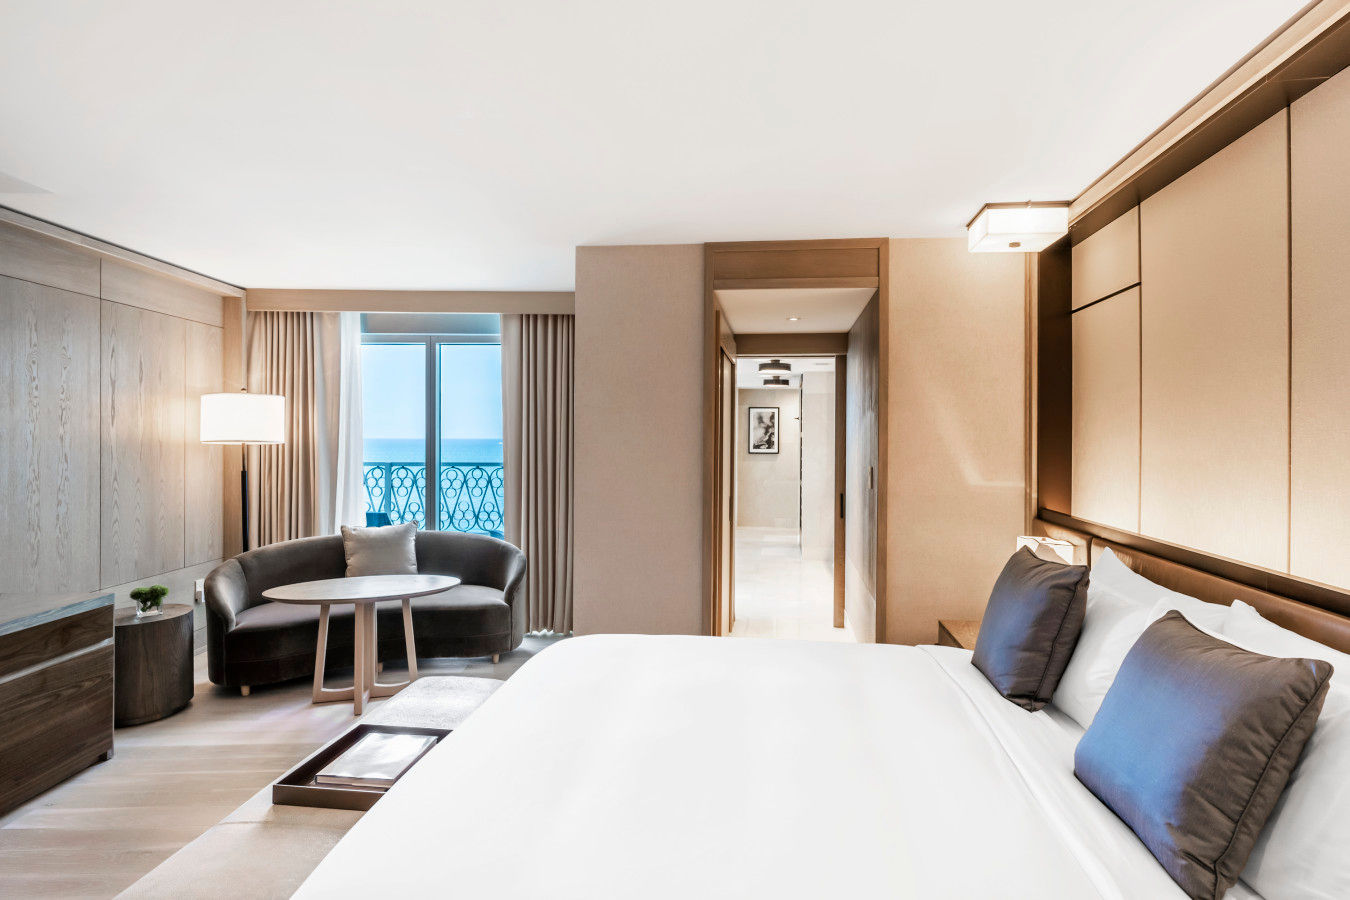 Nobu Villa Connecting Room - Nobu Hotel Miami Beach